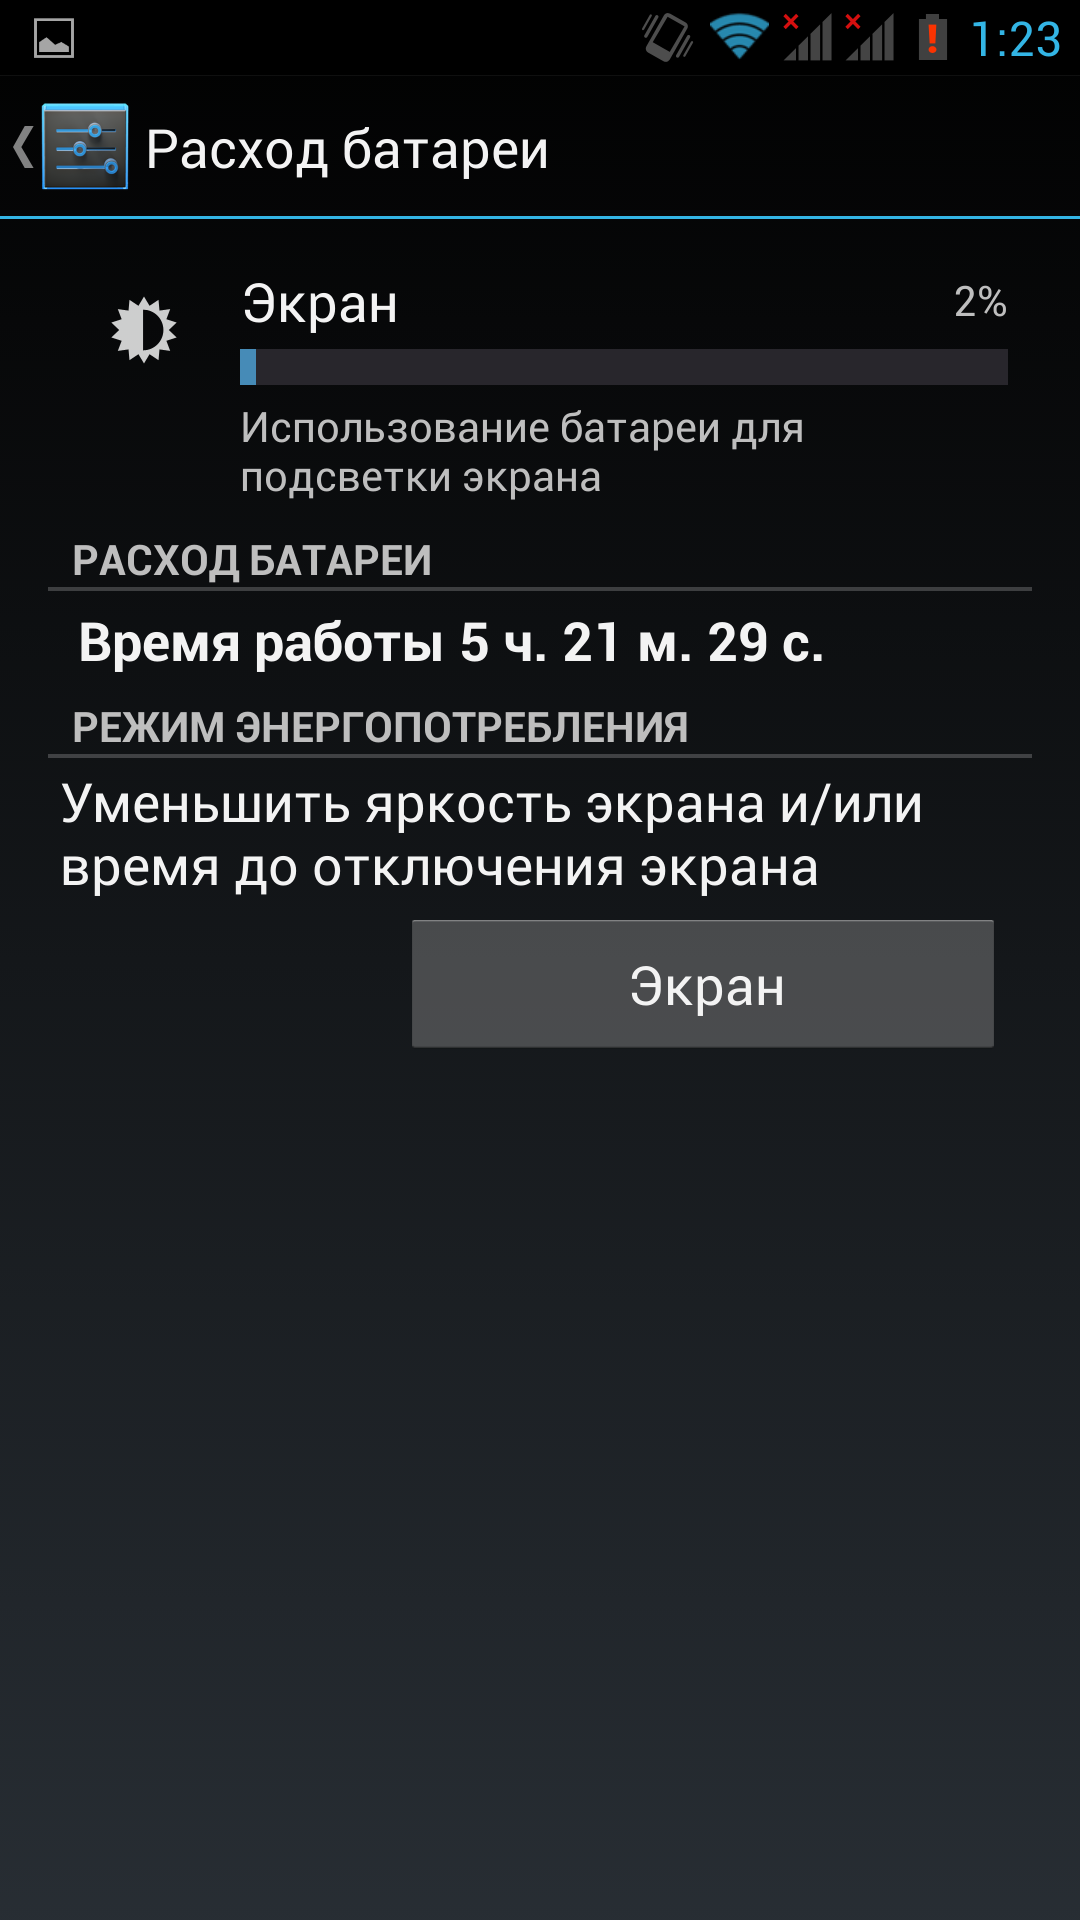 Screenshot_2014-07-13-01-23-04